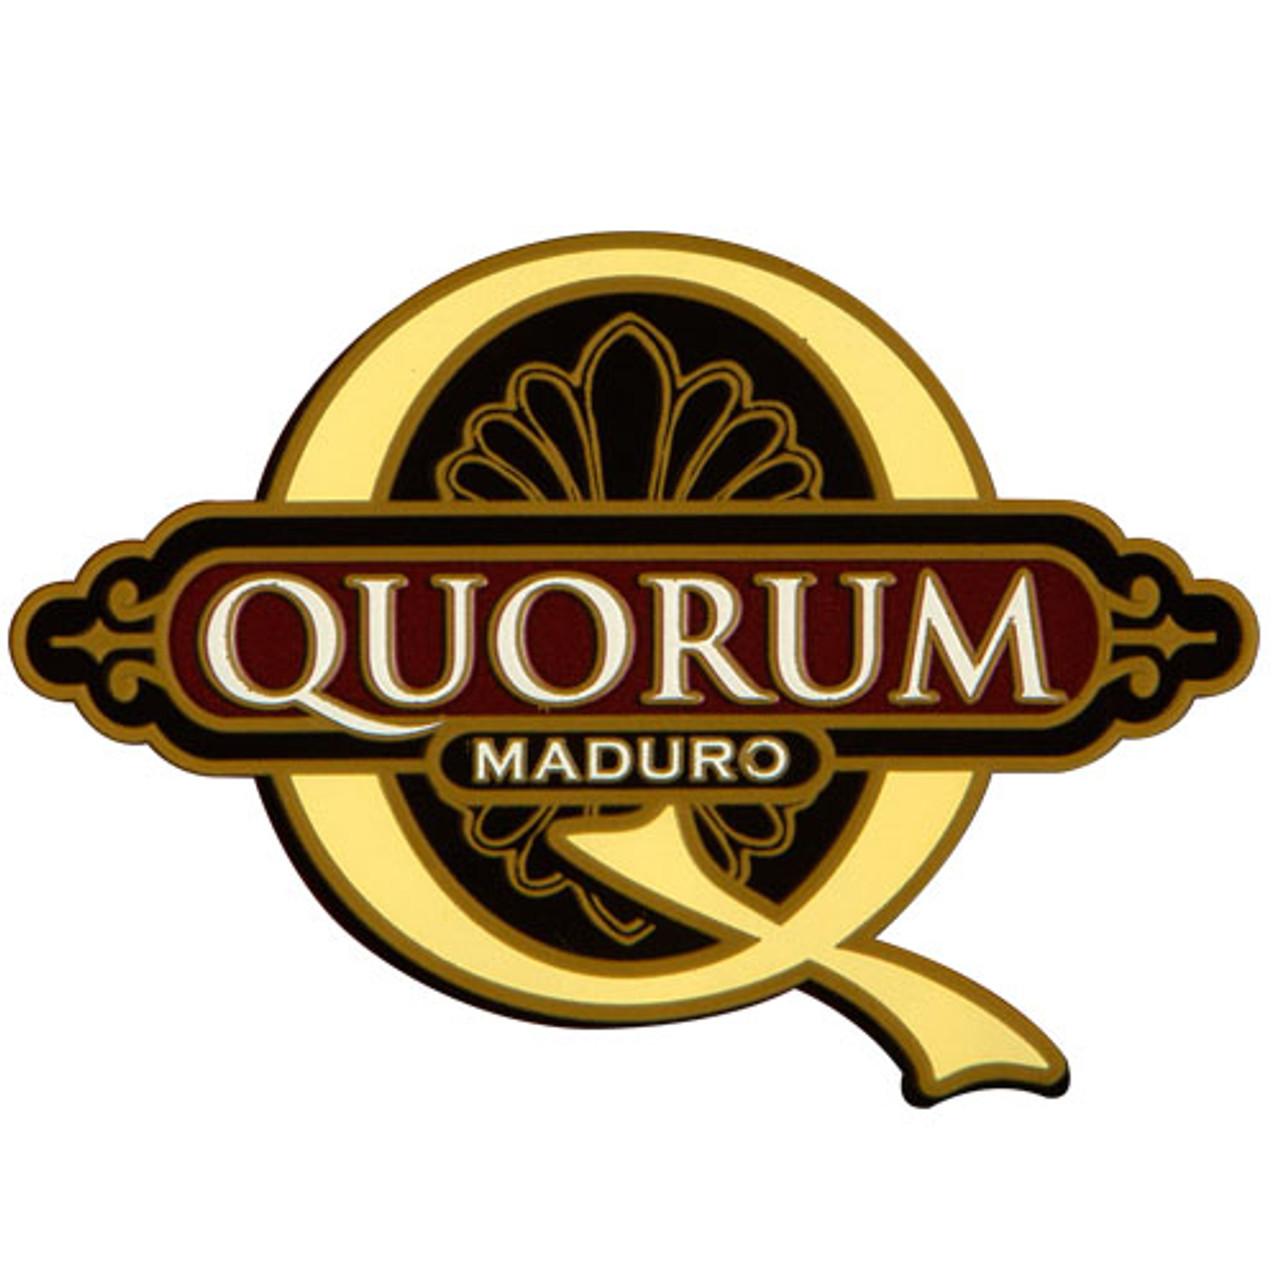 Quorum Maduro Robusto Cigars - 4.75 x 50 (Bundle of 20)